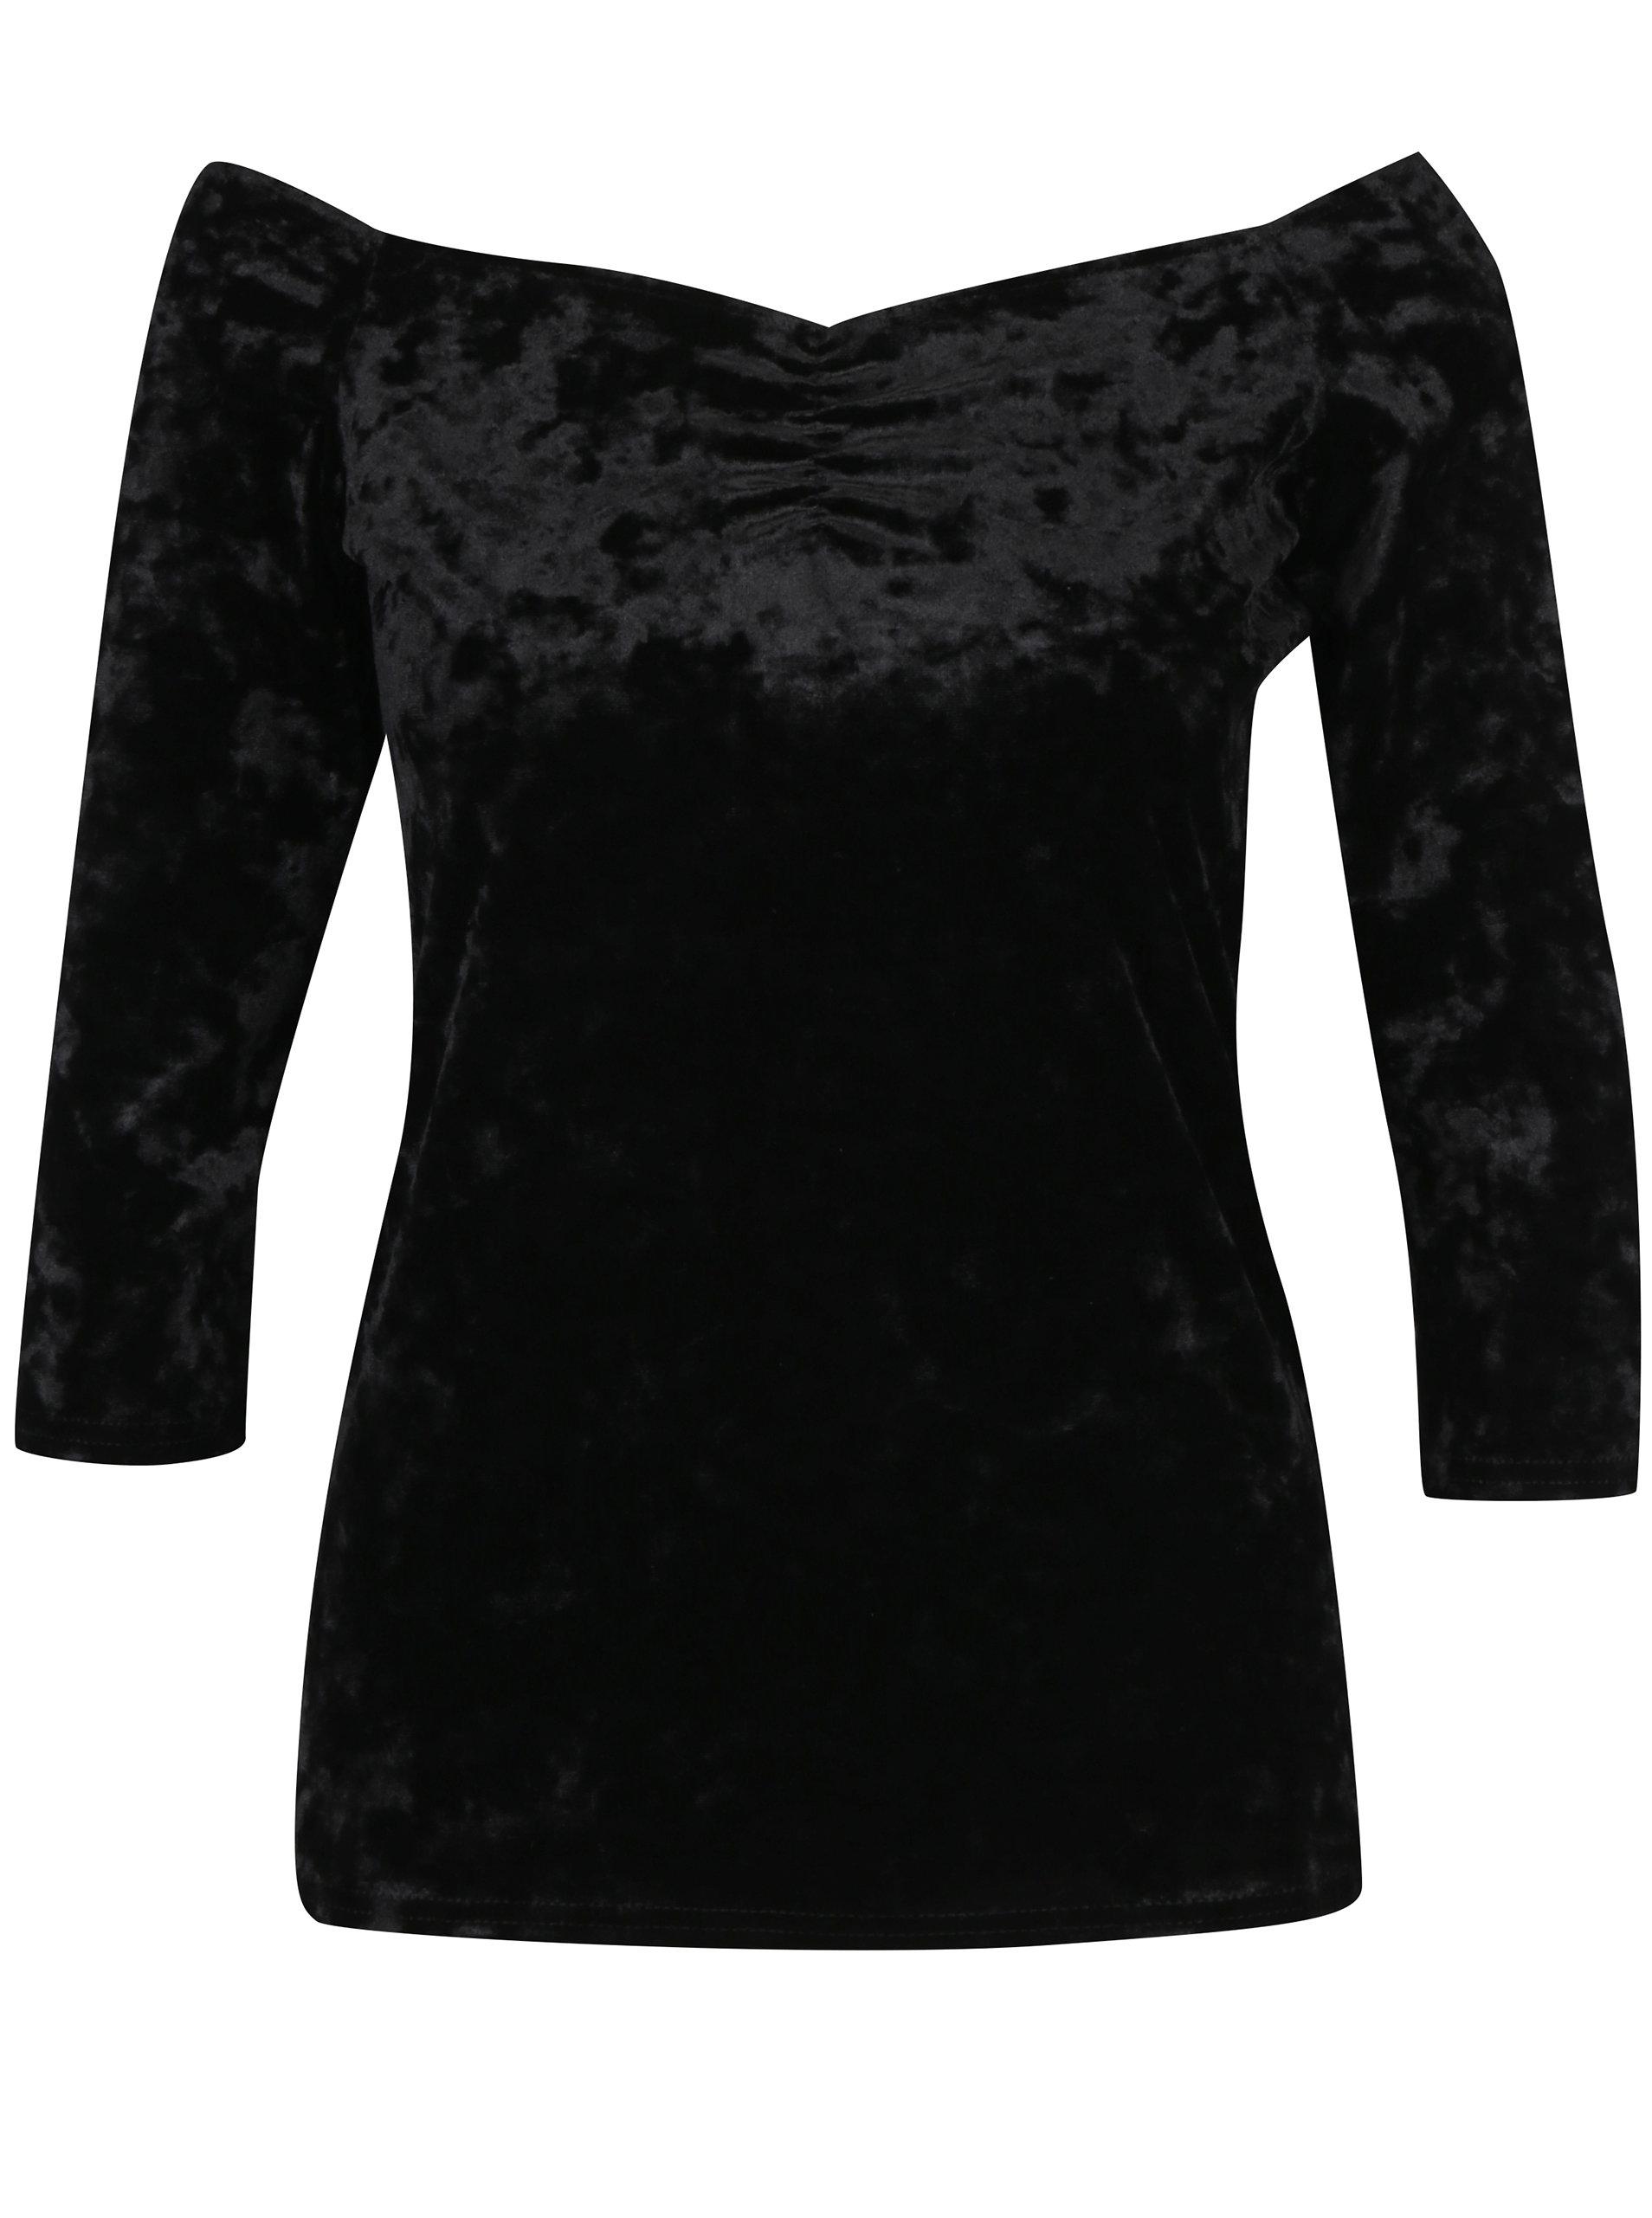 f75aa0a9228b Čierne zamatové tričko s lodičkovým výstrihom Dorothy Perkins ...